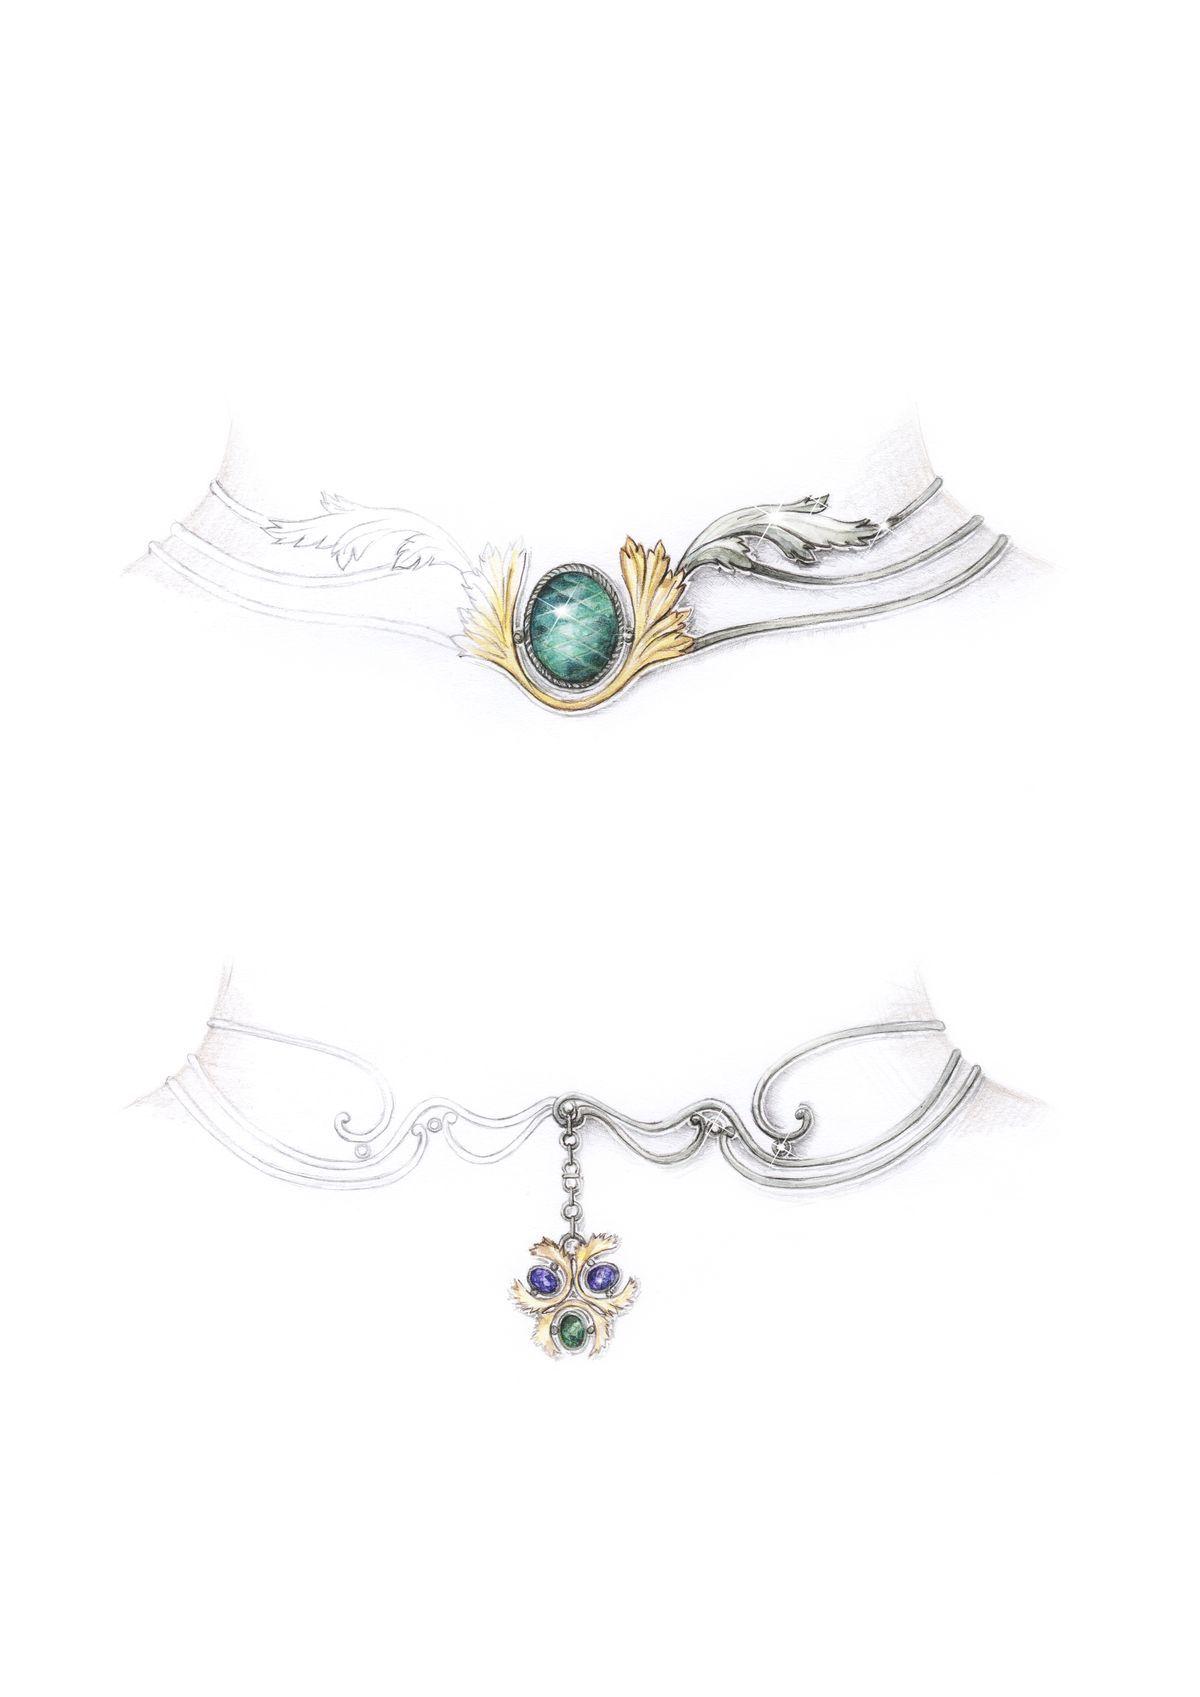 Bcaeaeffdaebg jeweled